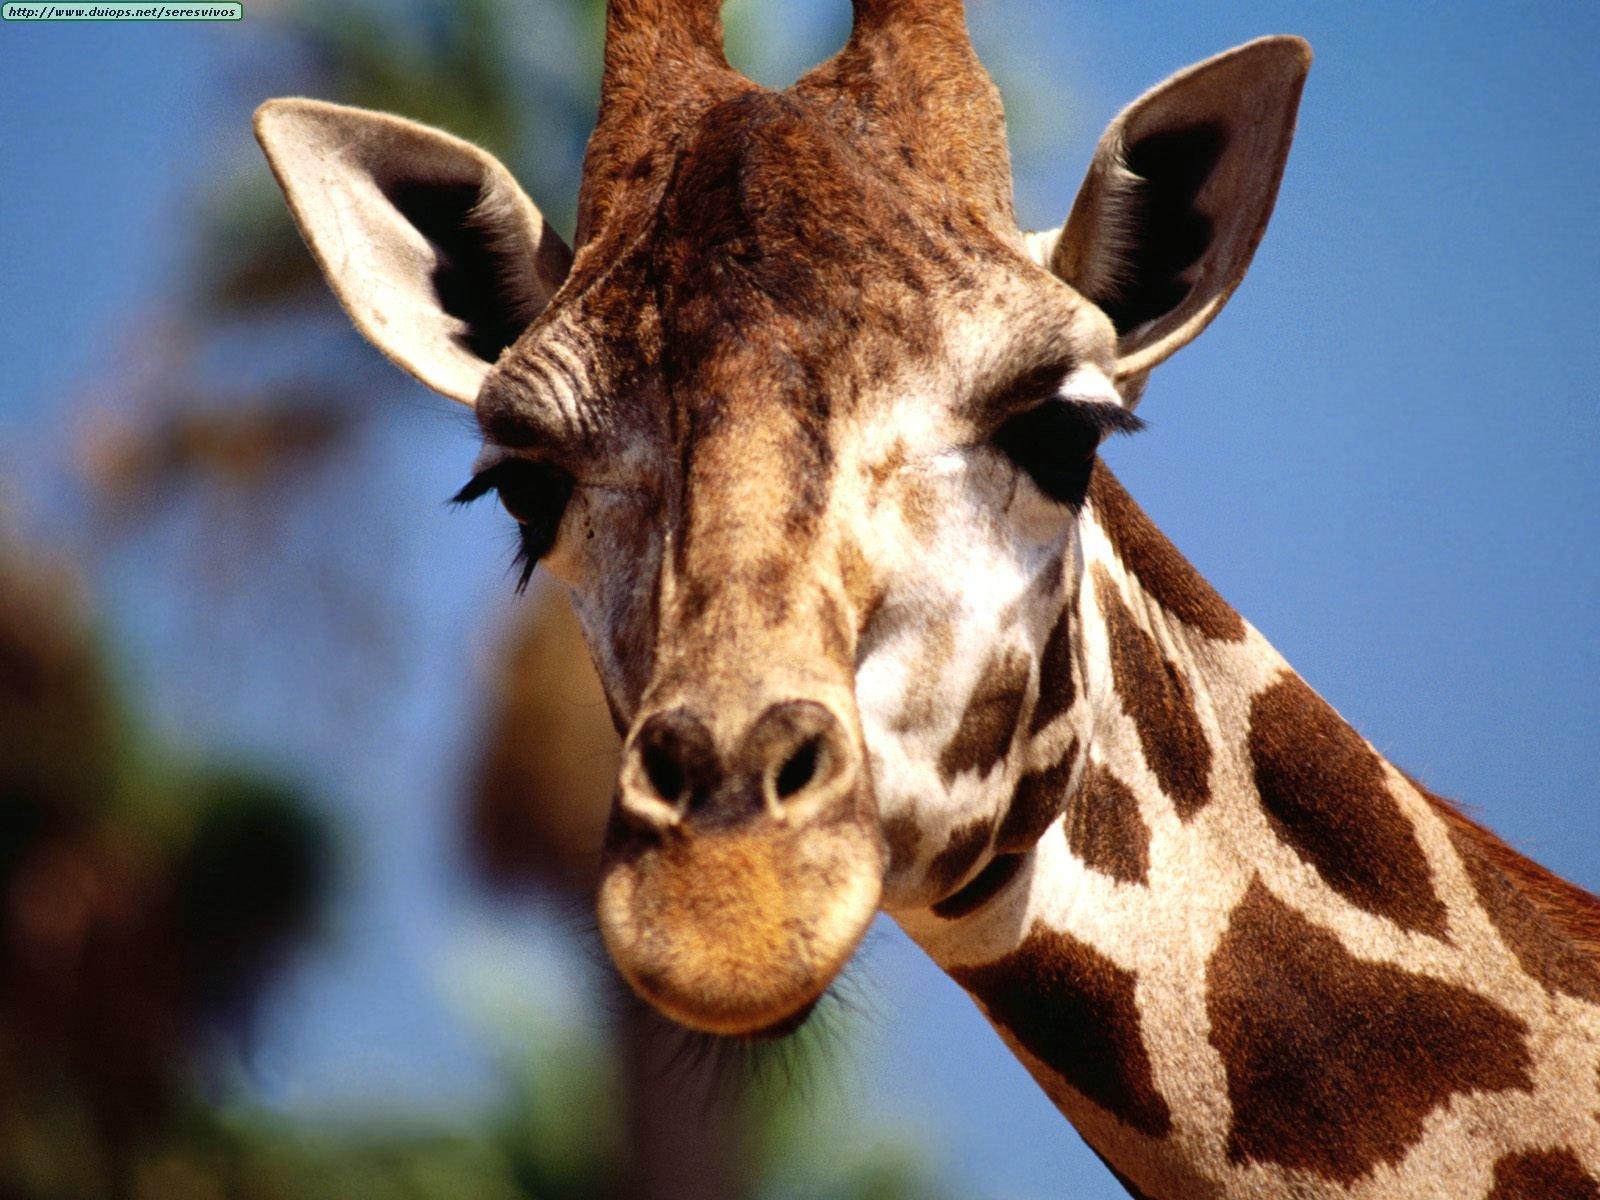 Animals%20Giraffes_Ready%20For%20My%20Close-Up.jpg